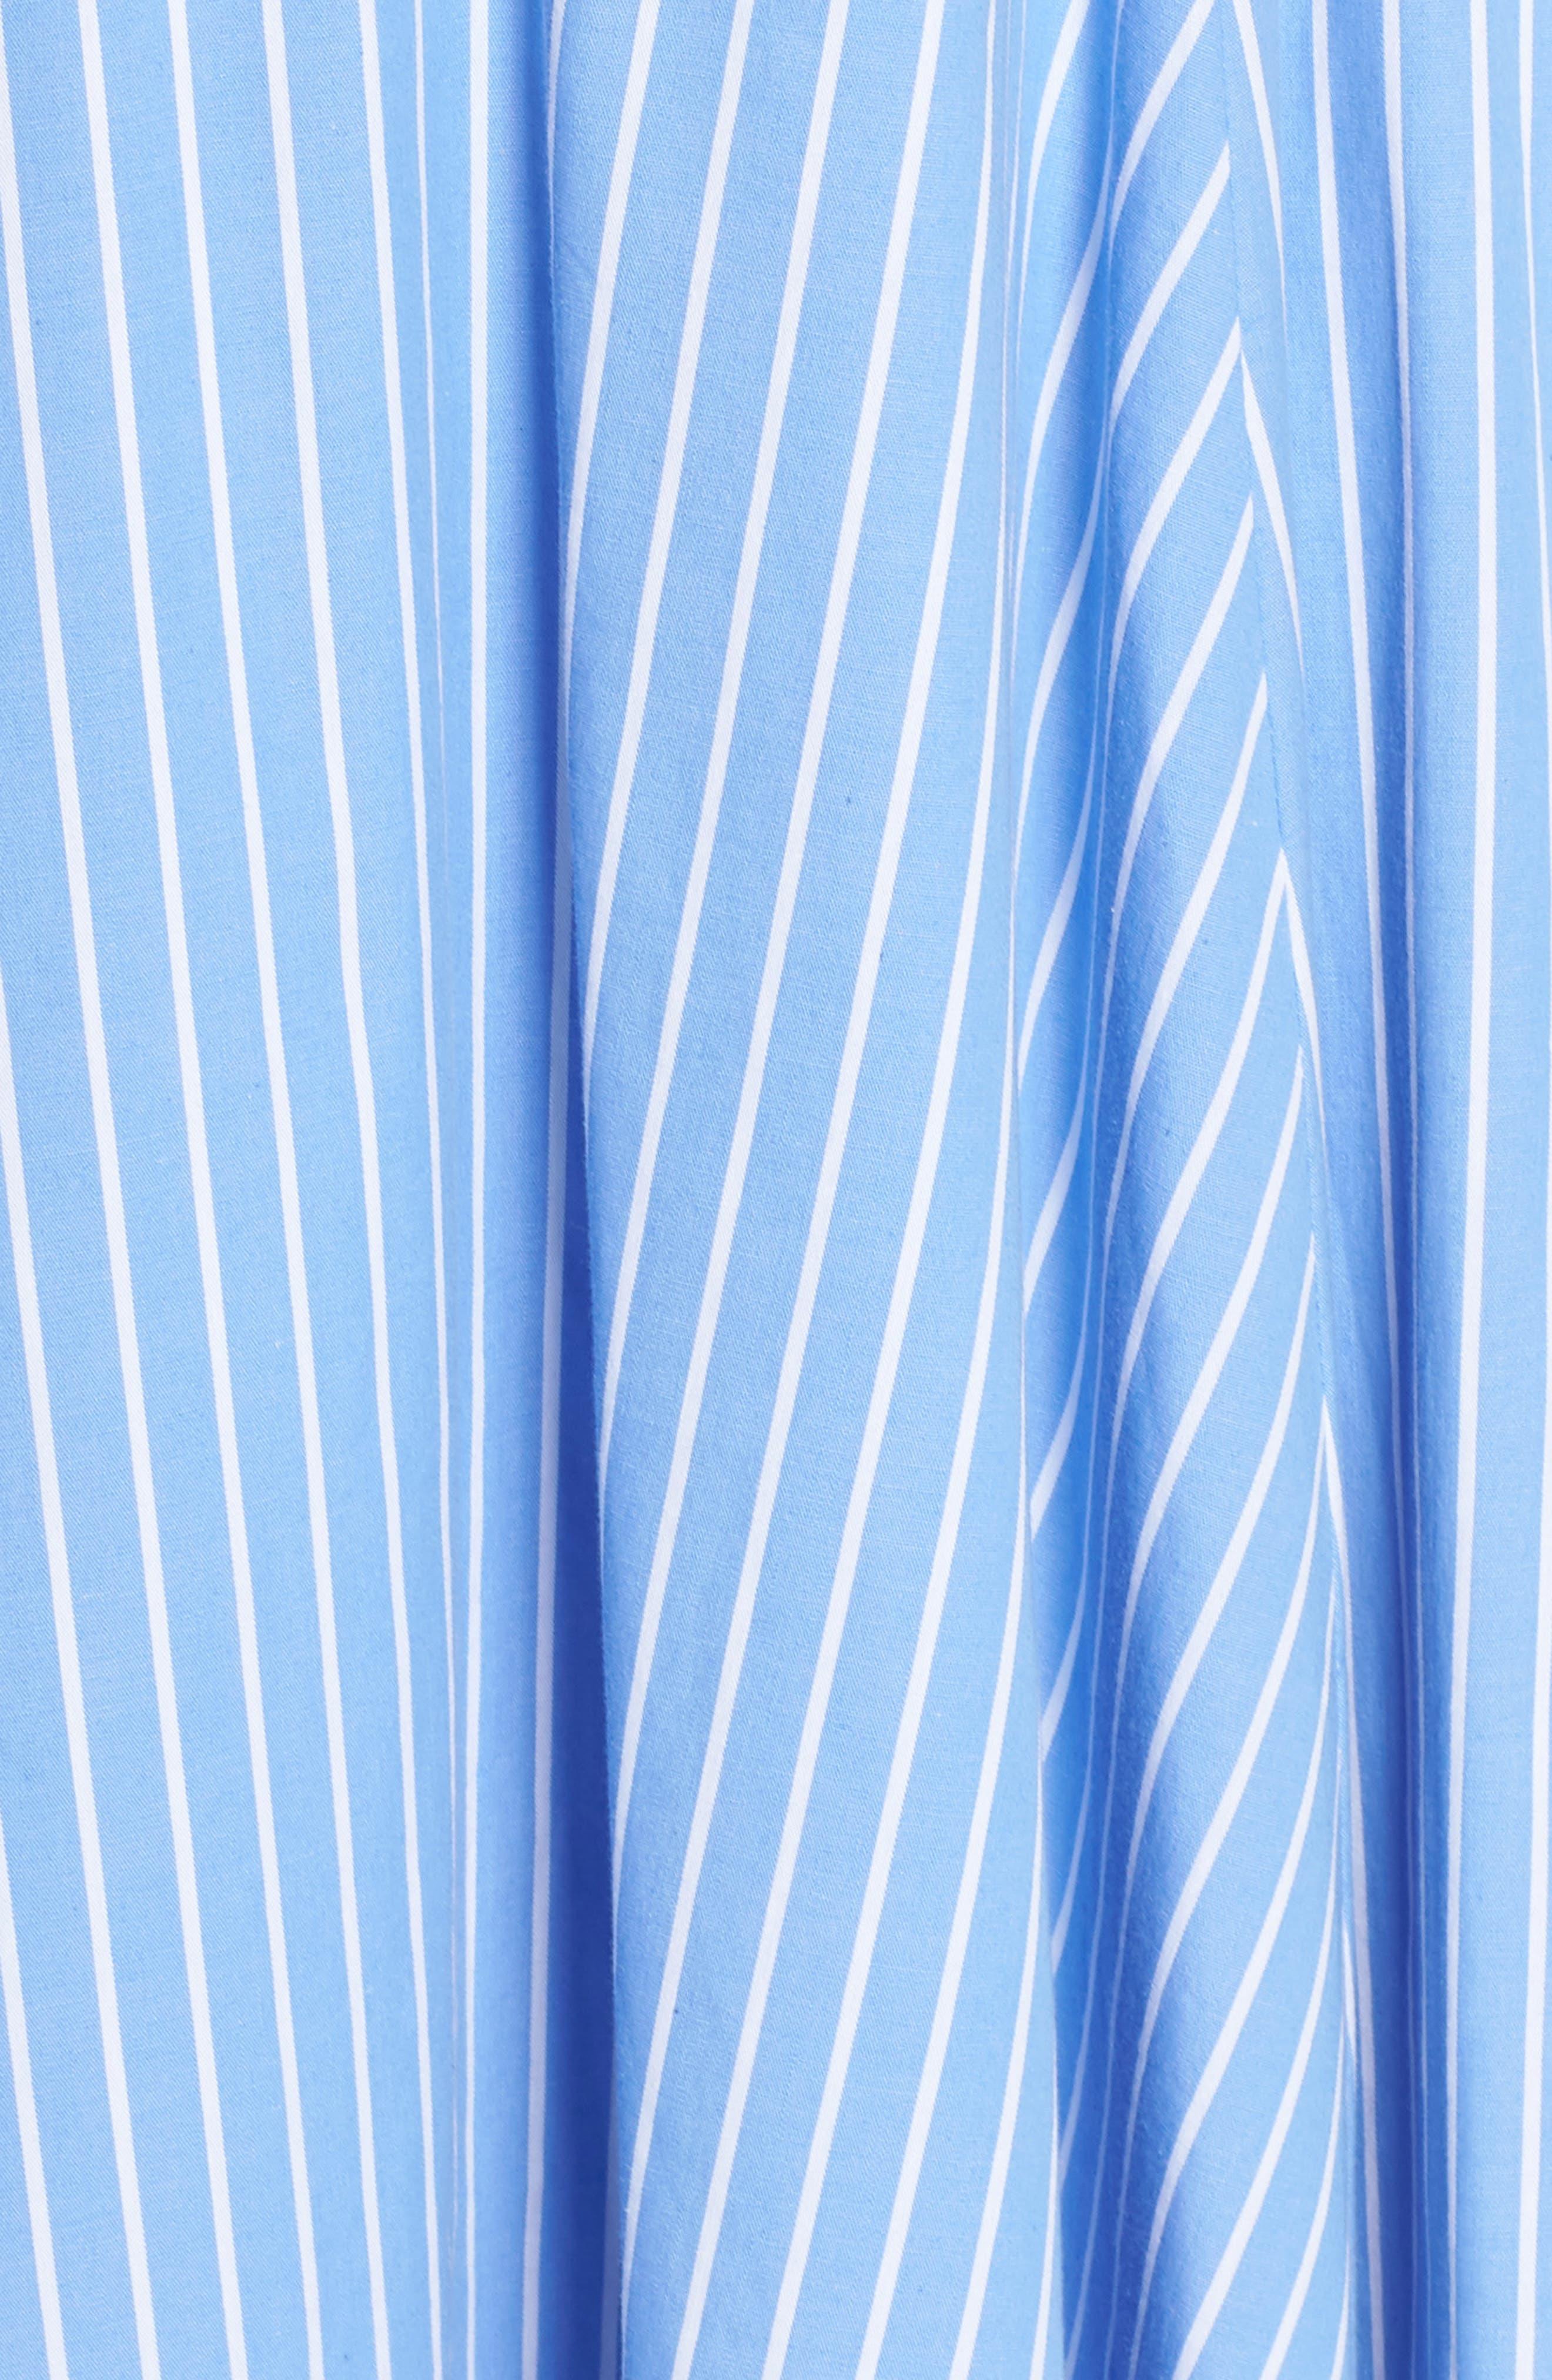 Morrow Stripe Corset Gown,                             Alternate thumbnail 6, color,                             450